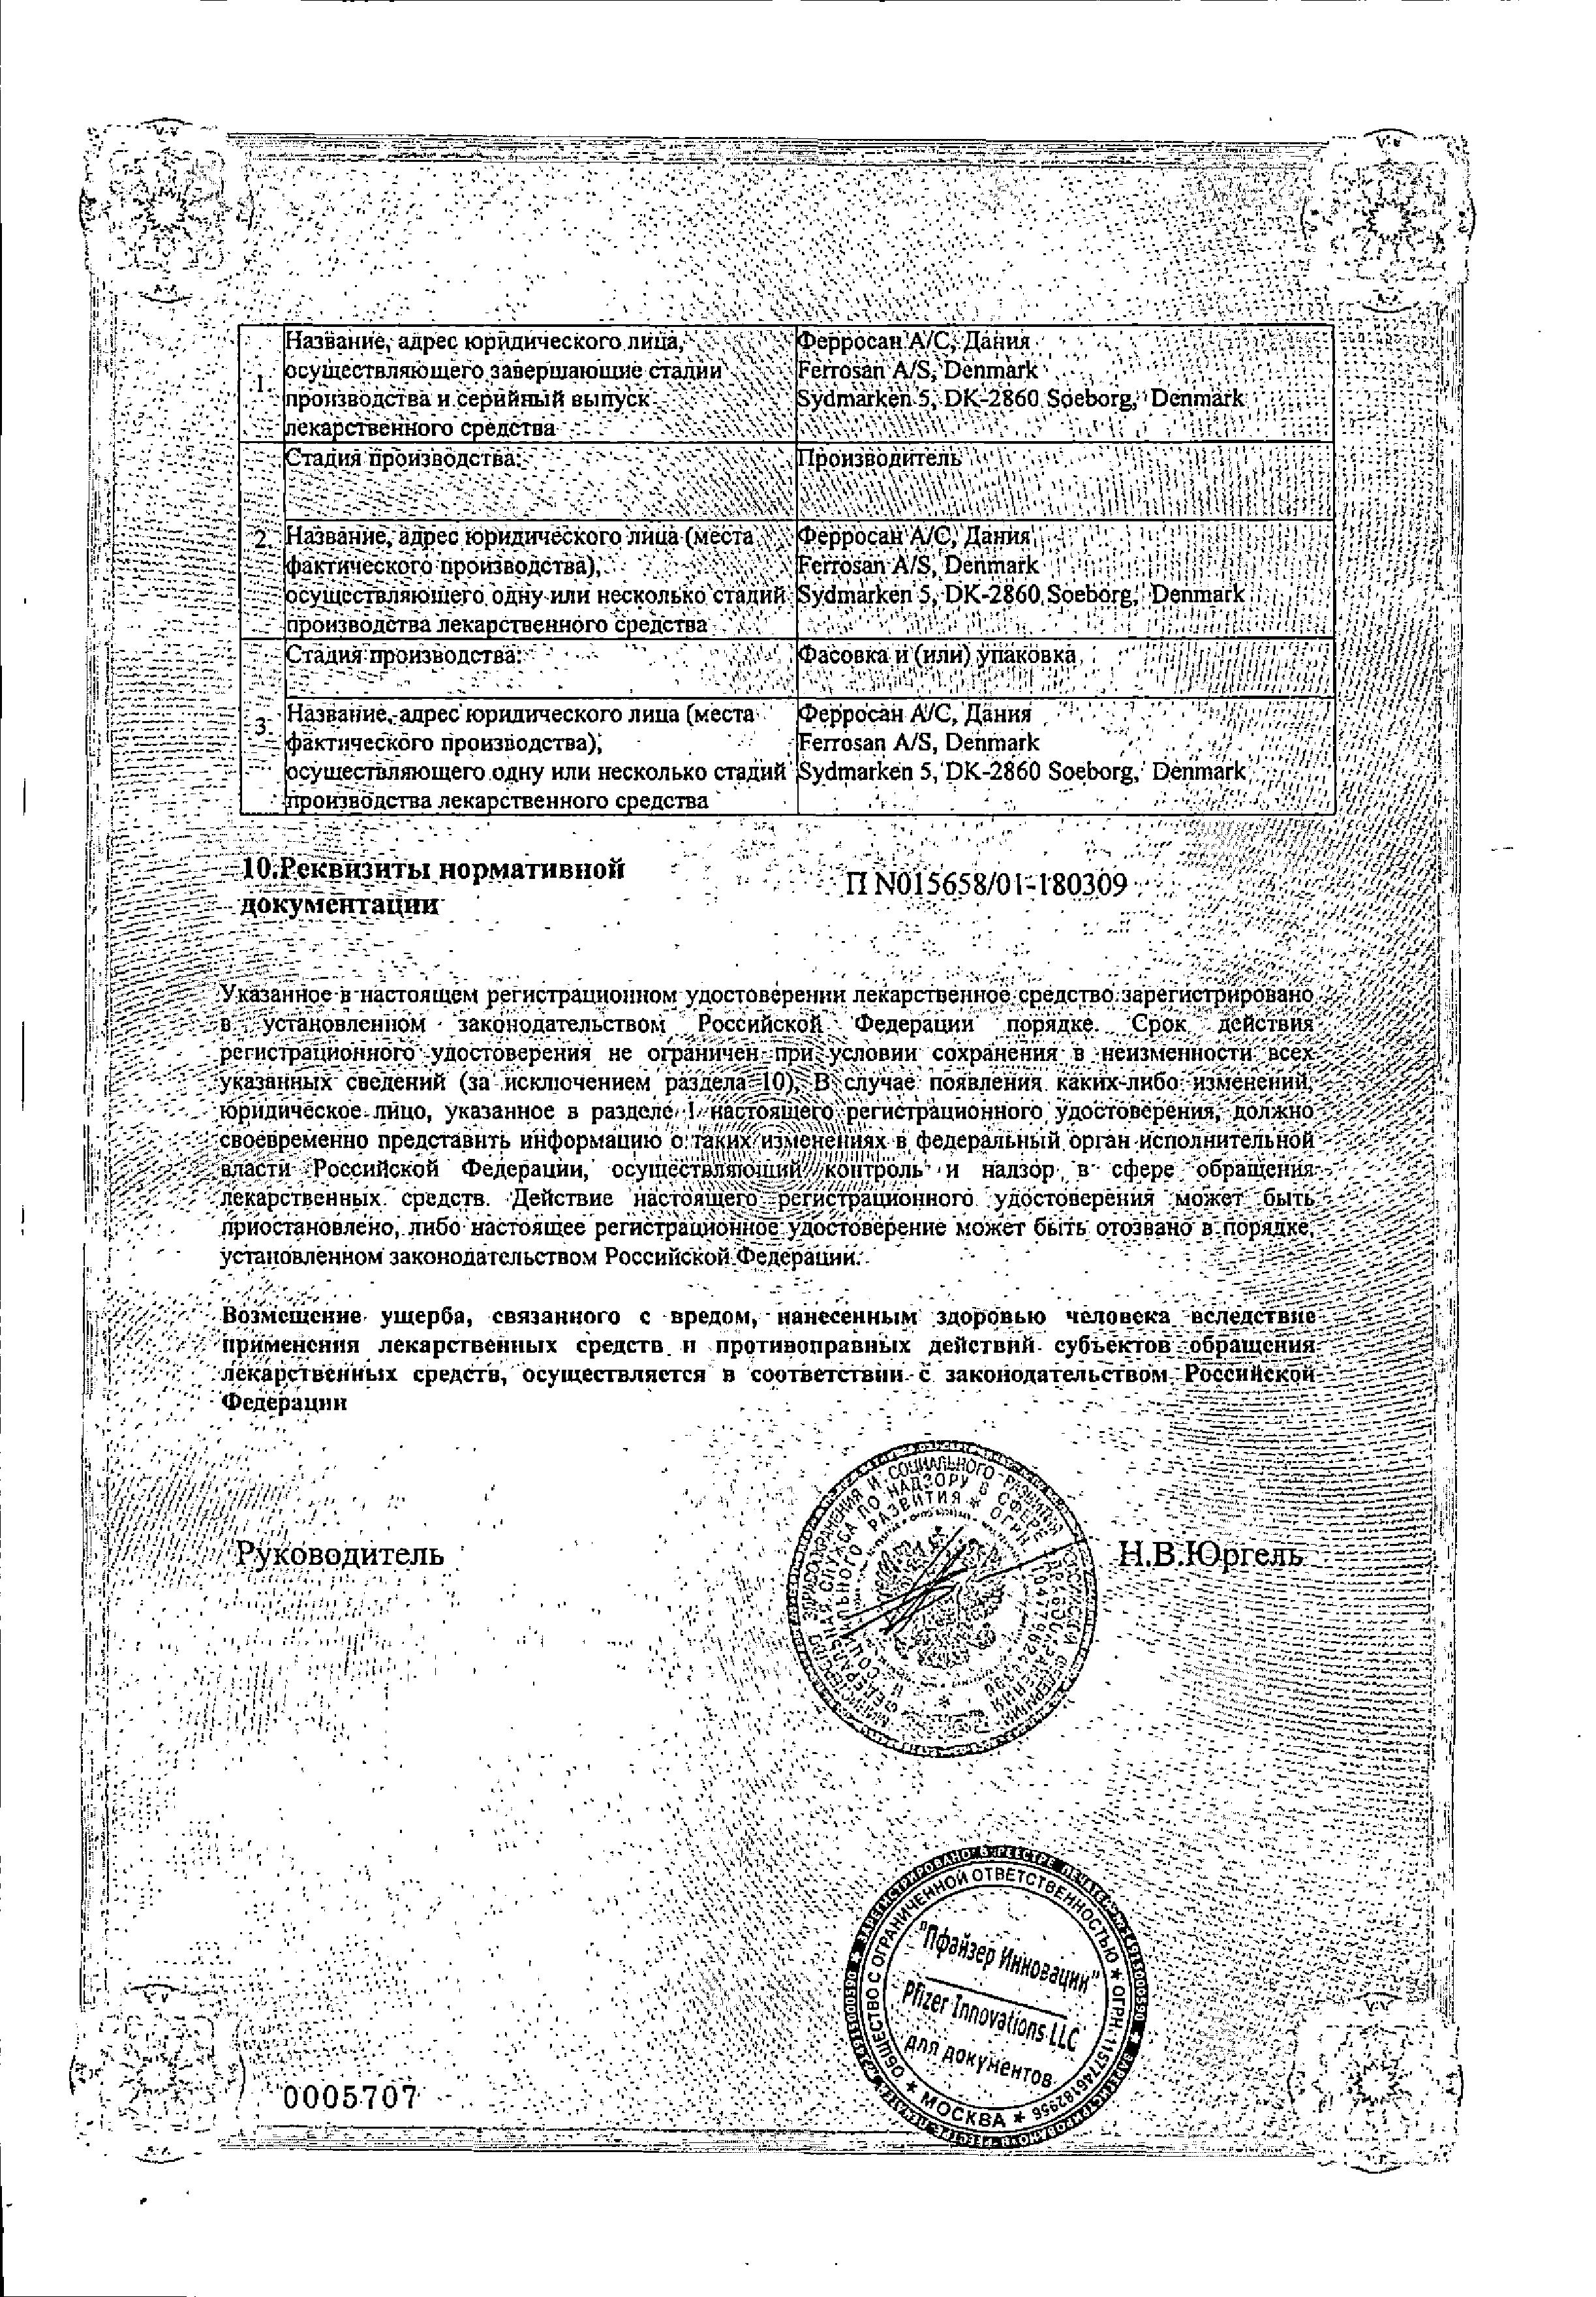 Стрикс сертификат